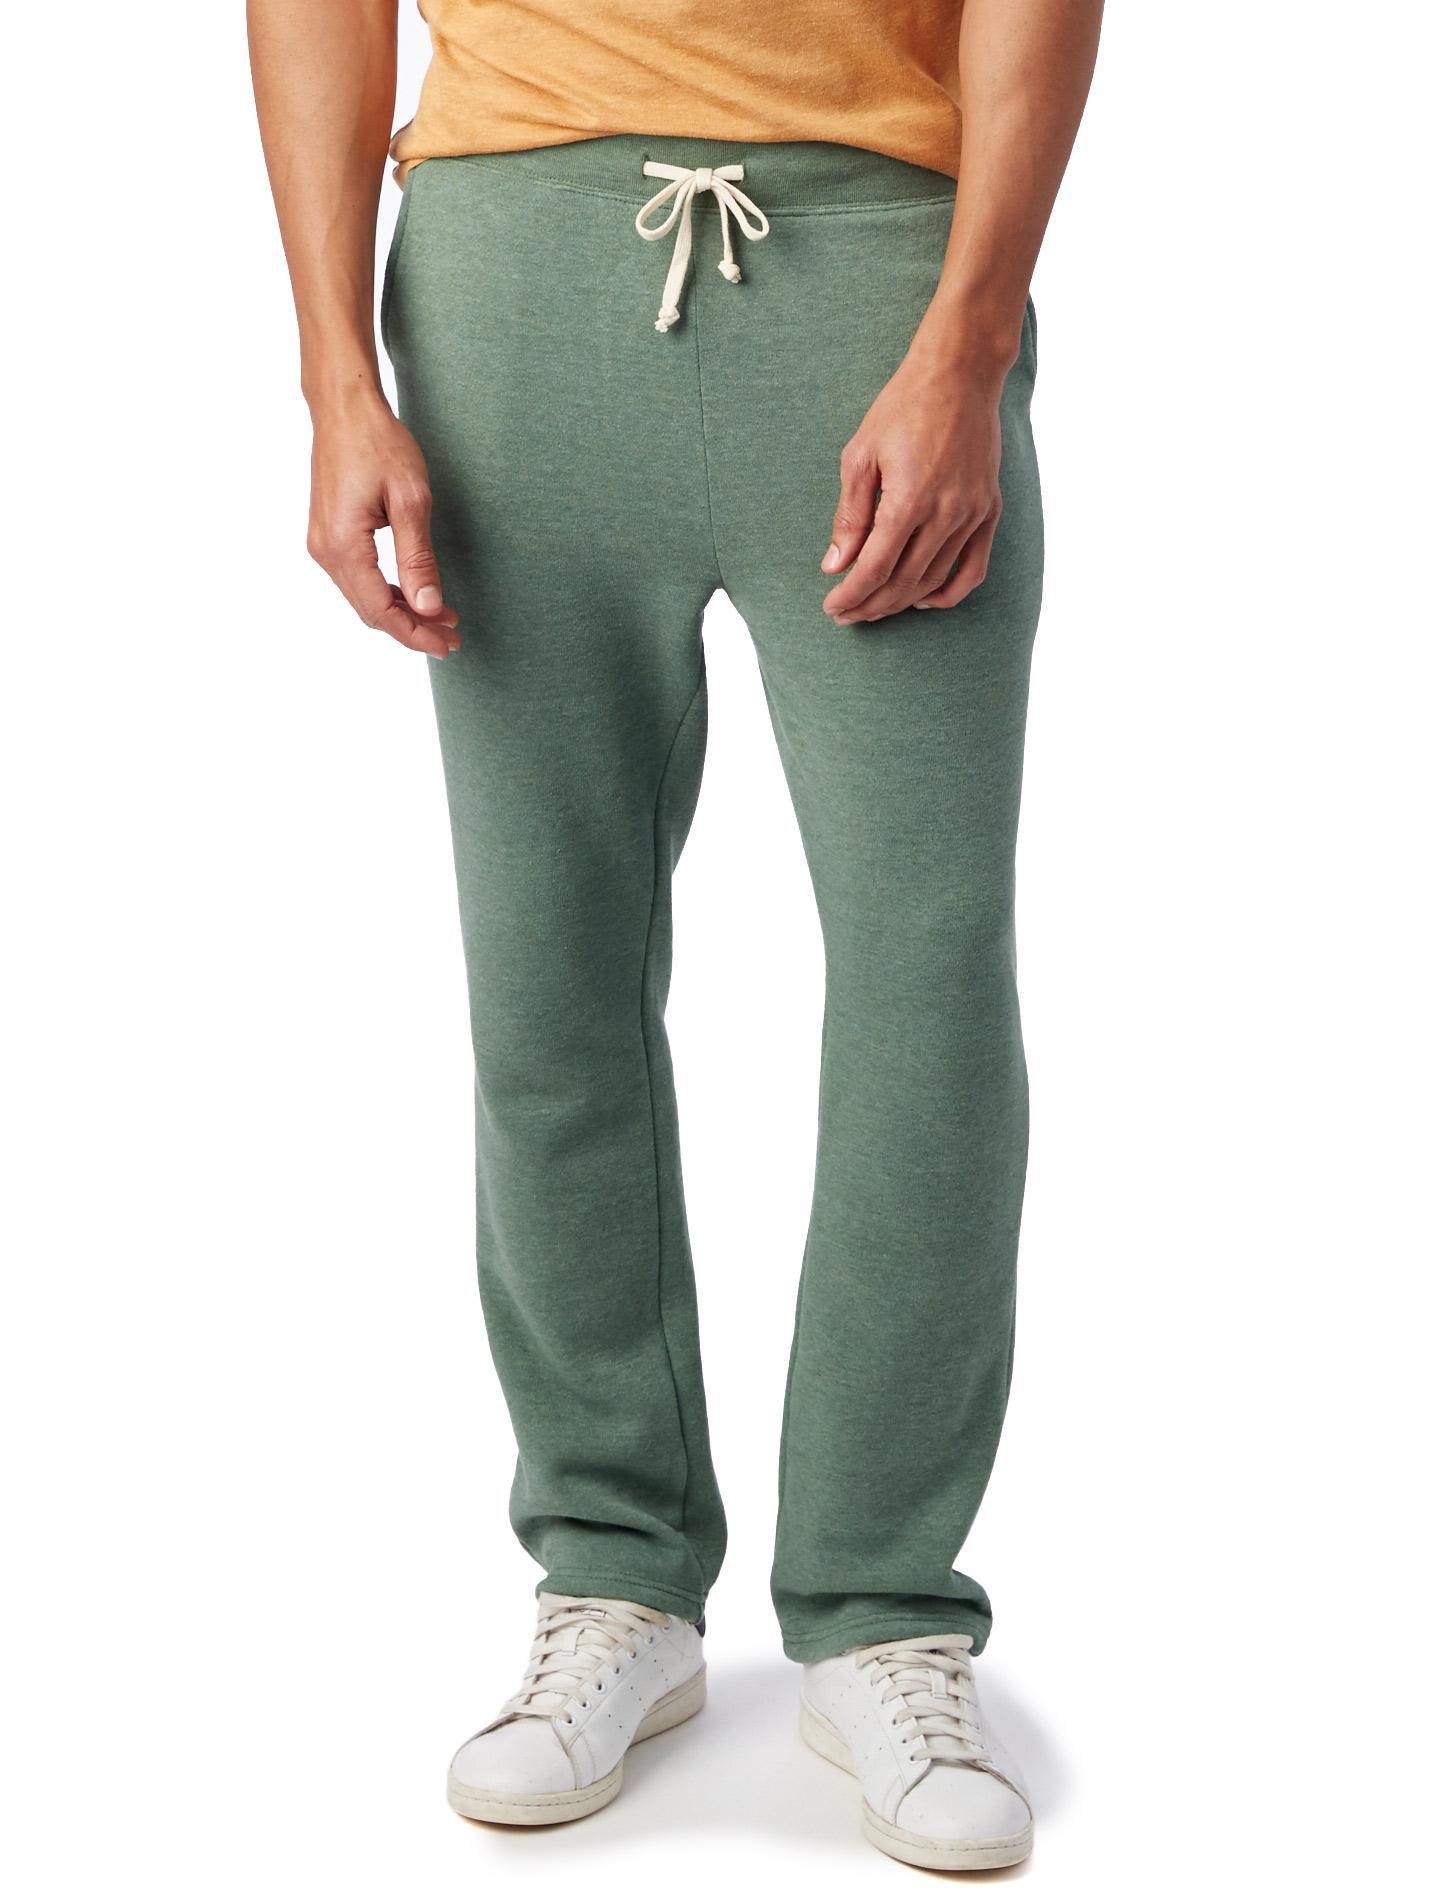 ee92e1ad1 Alternative Apparel. Men's Green Hustle Eco-fleece Open Bottom Sweatpants